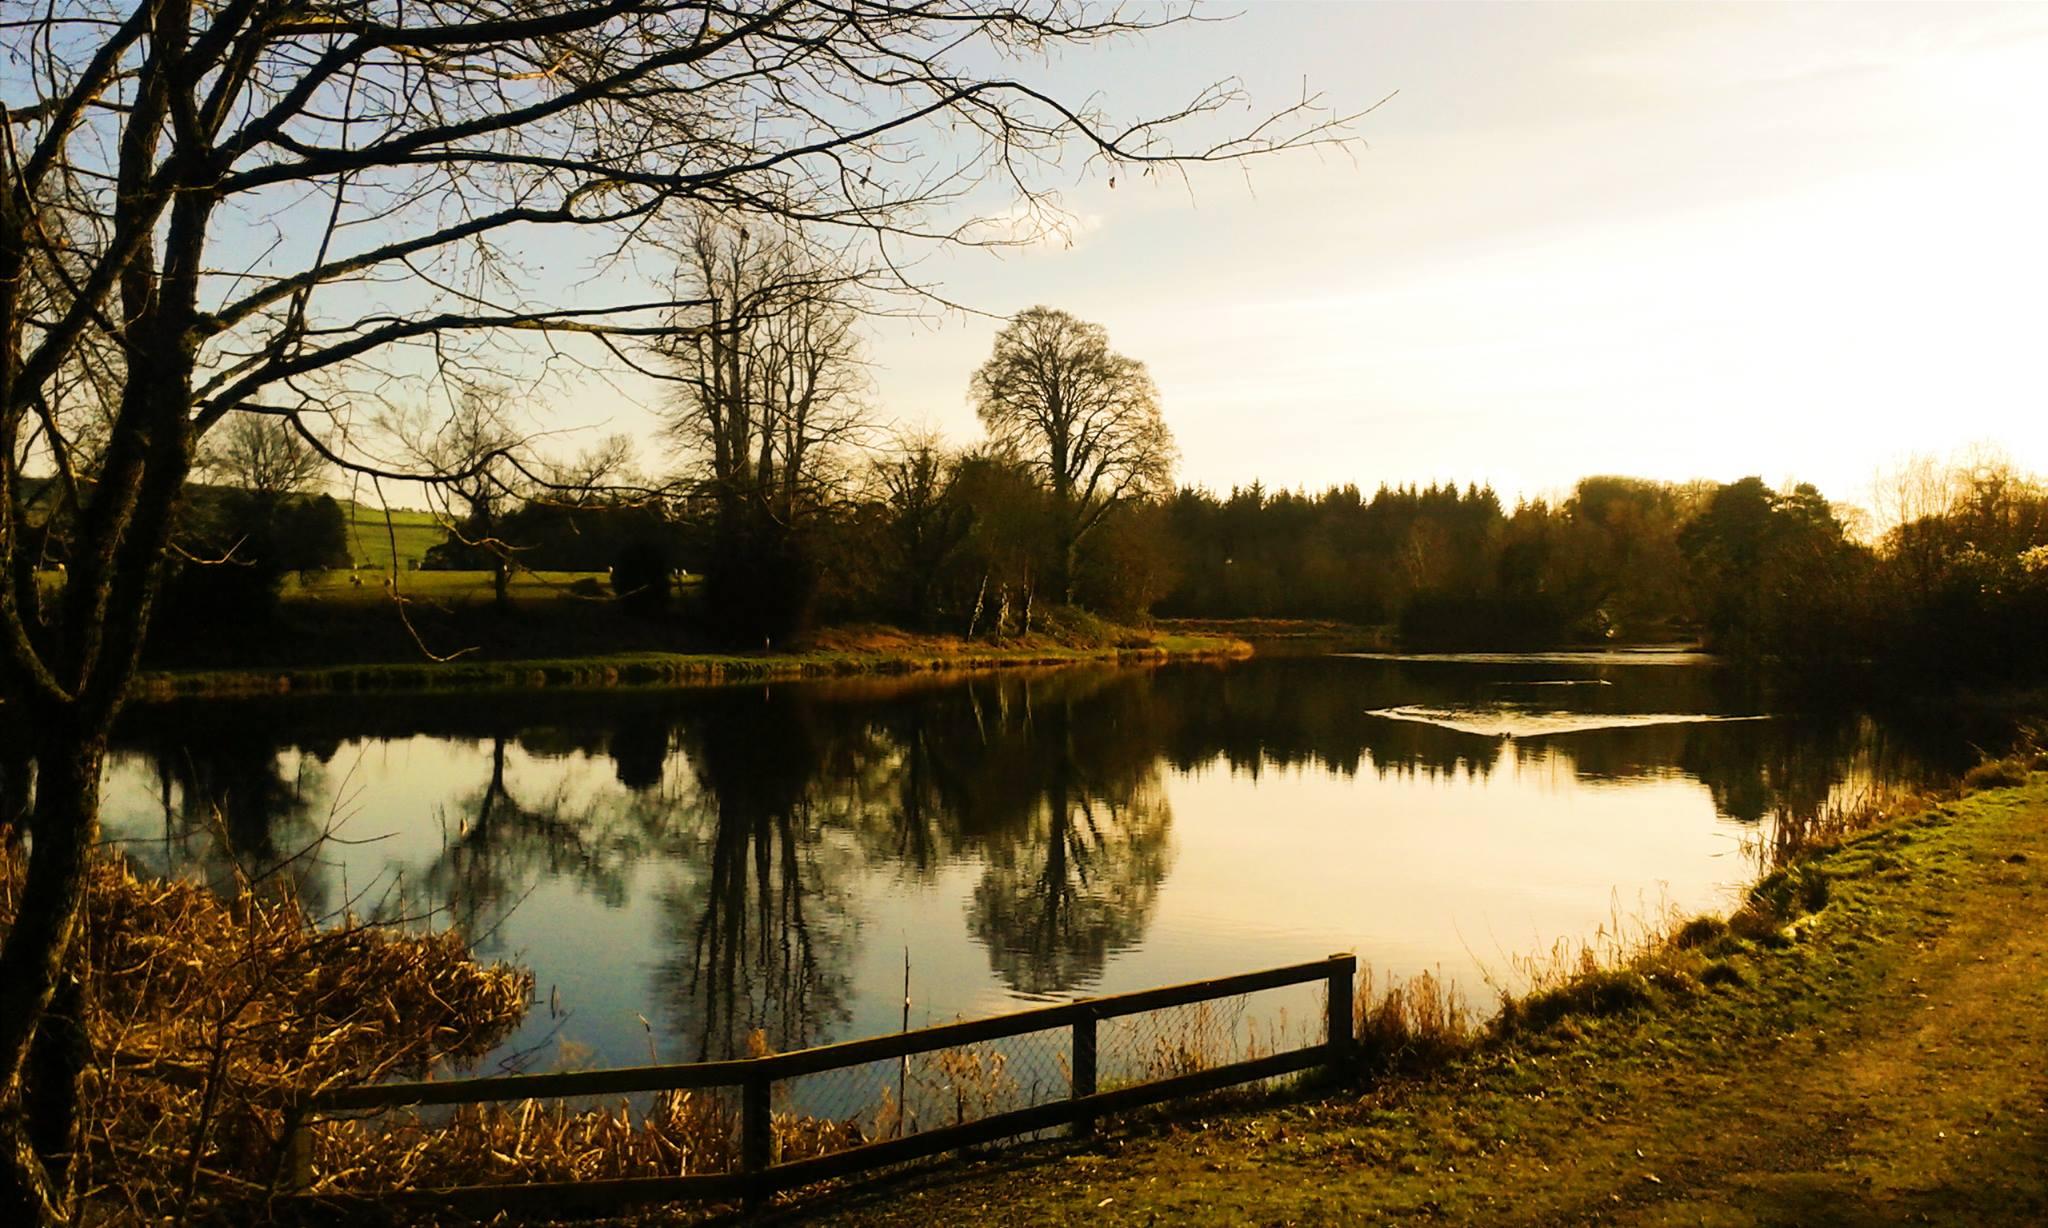 Stradbally Lake